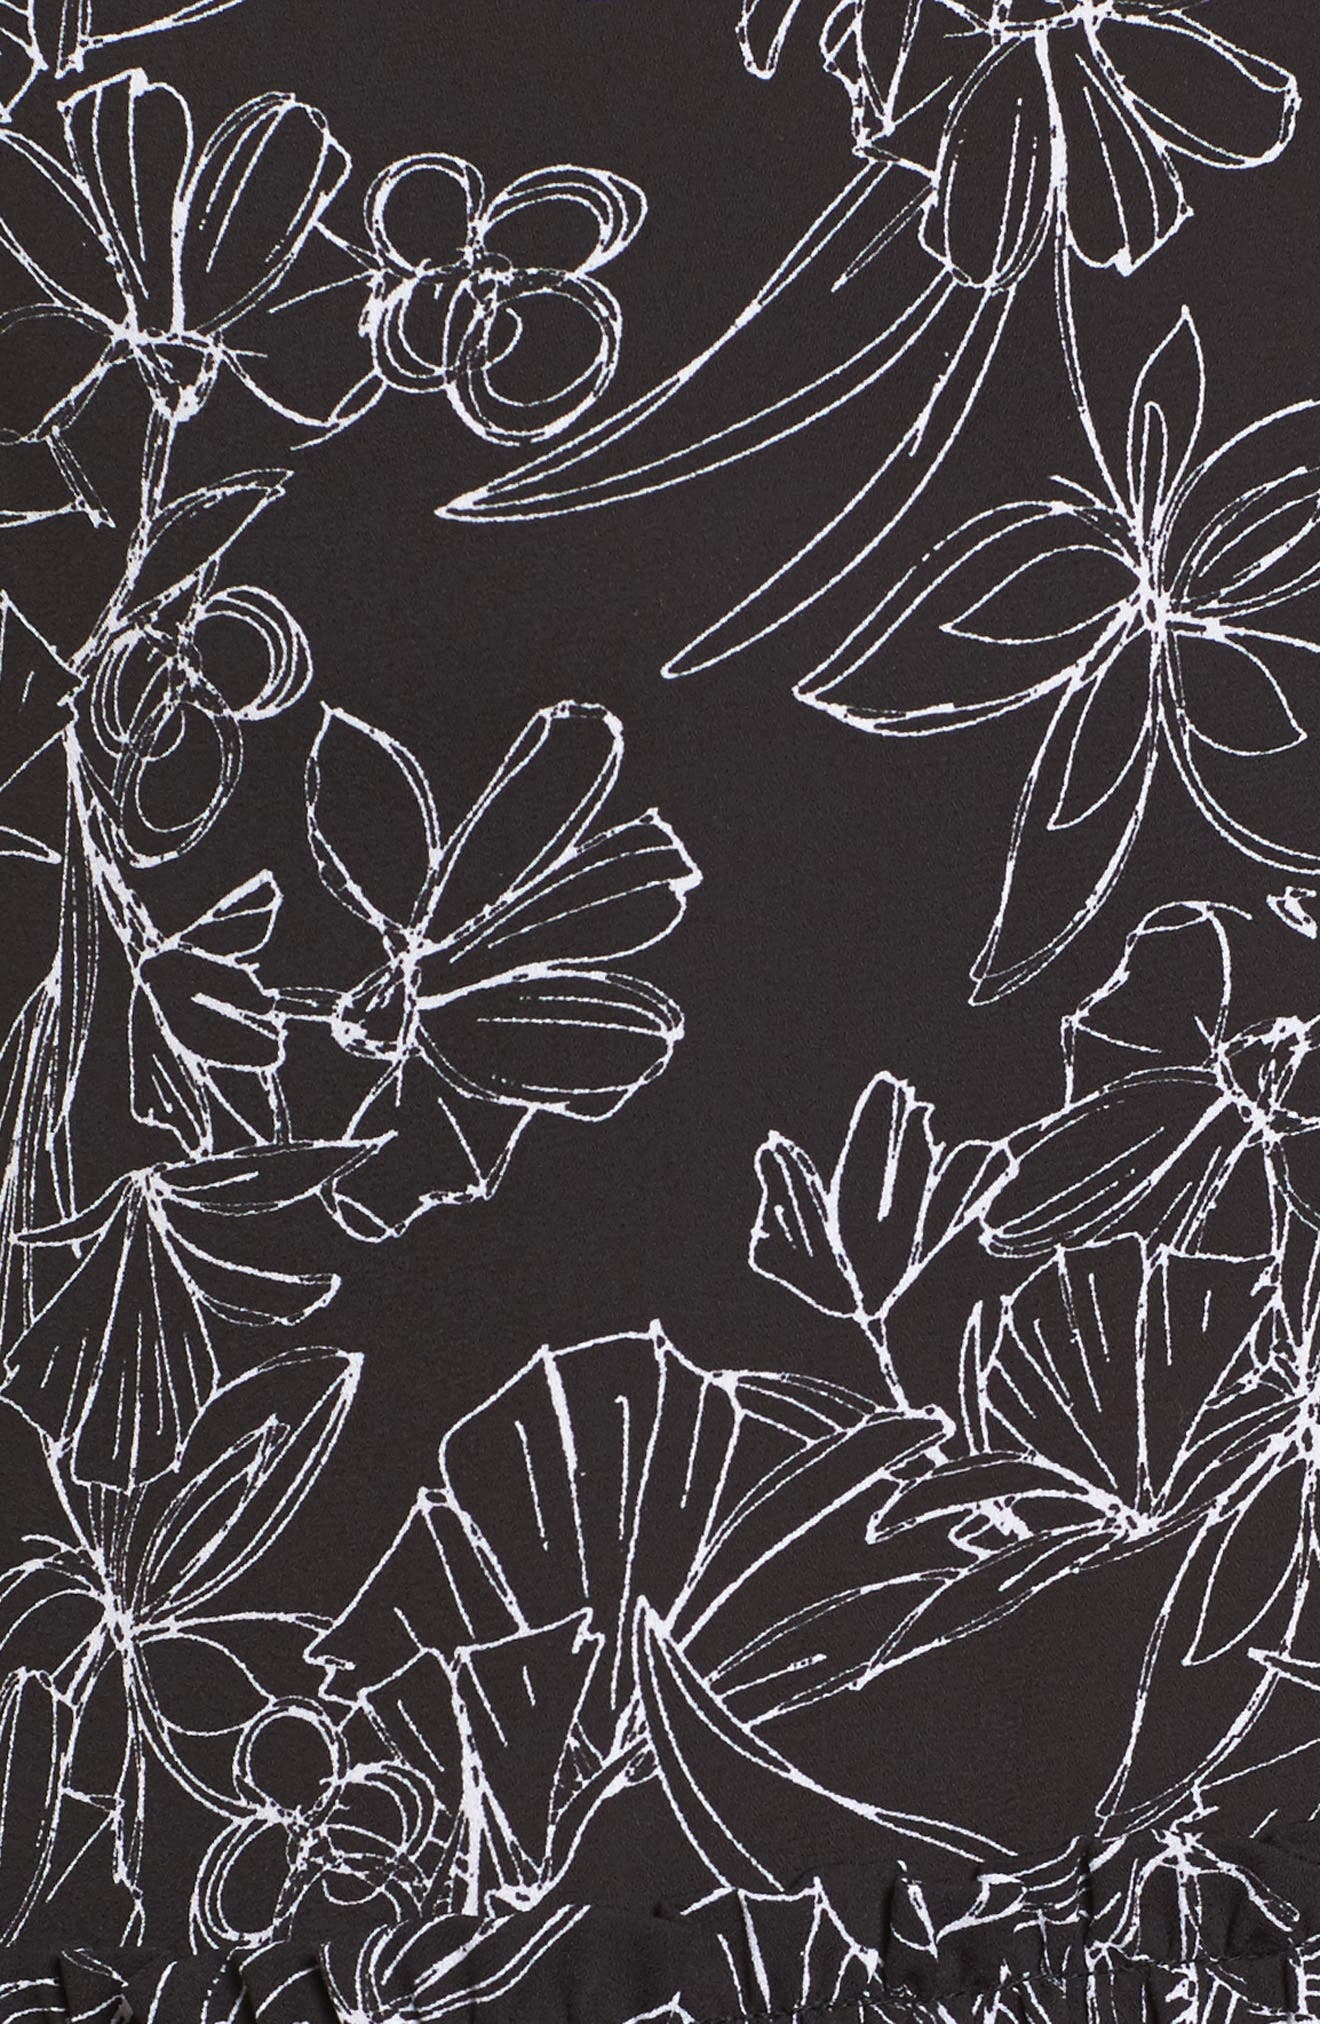 Drop Ruffle Tank Top,                             Alternate thumbnail 5, color,                             Black- White Floral